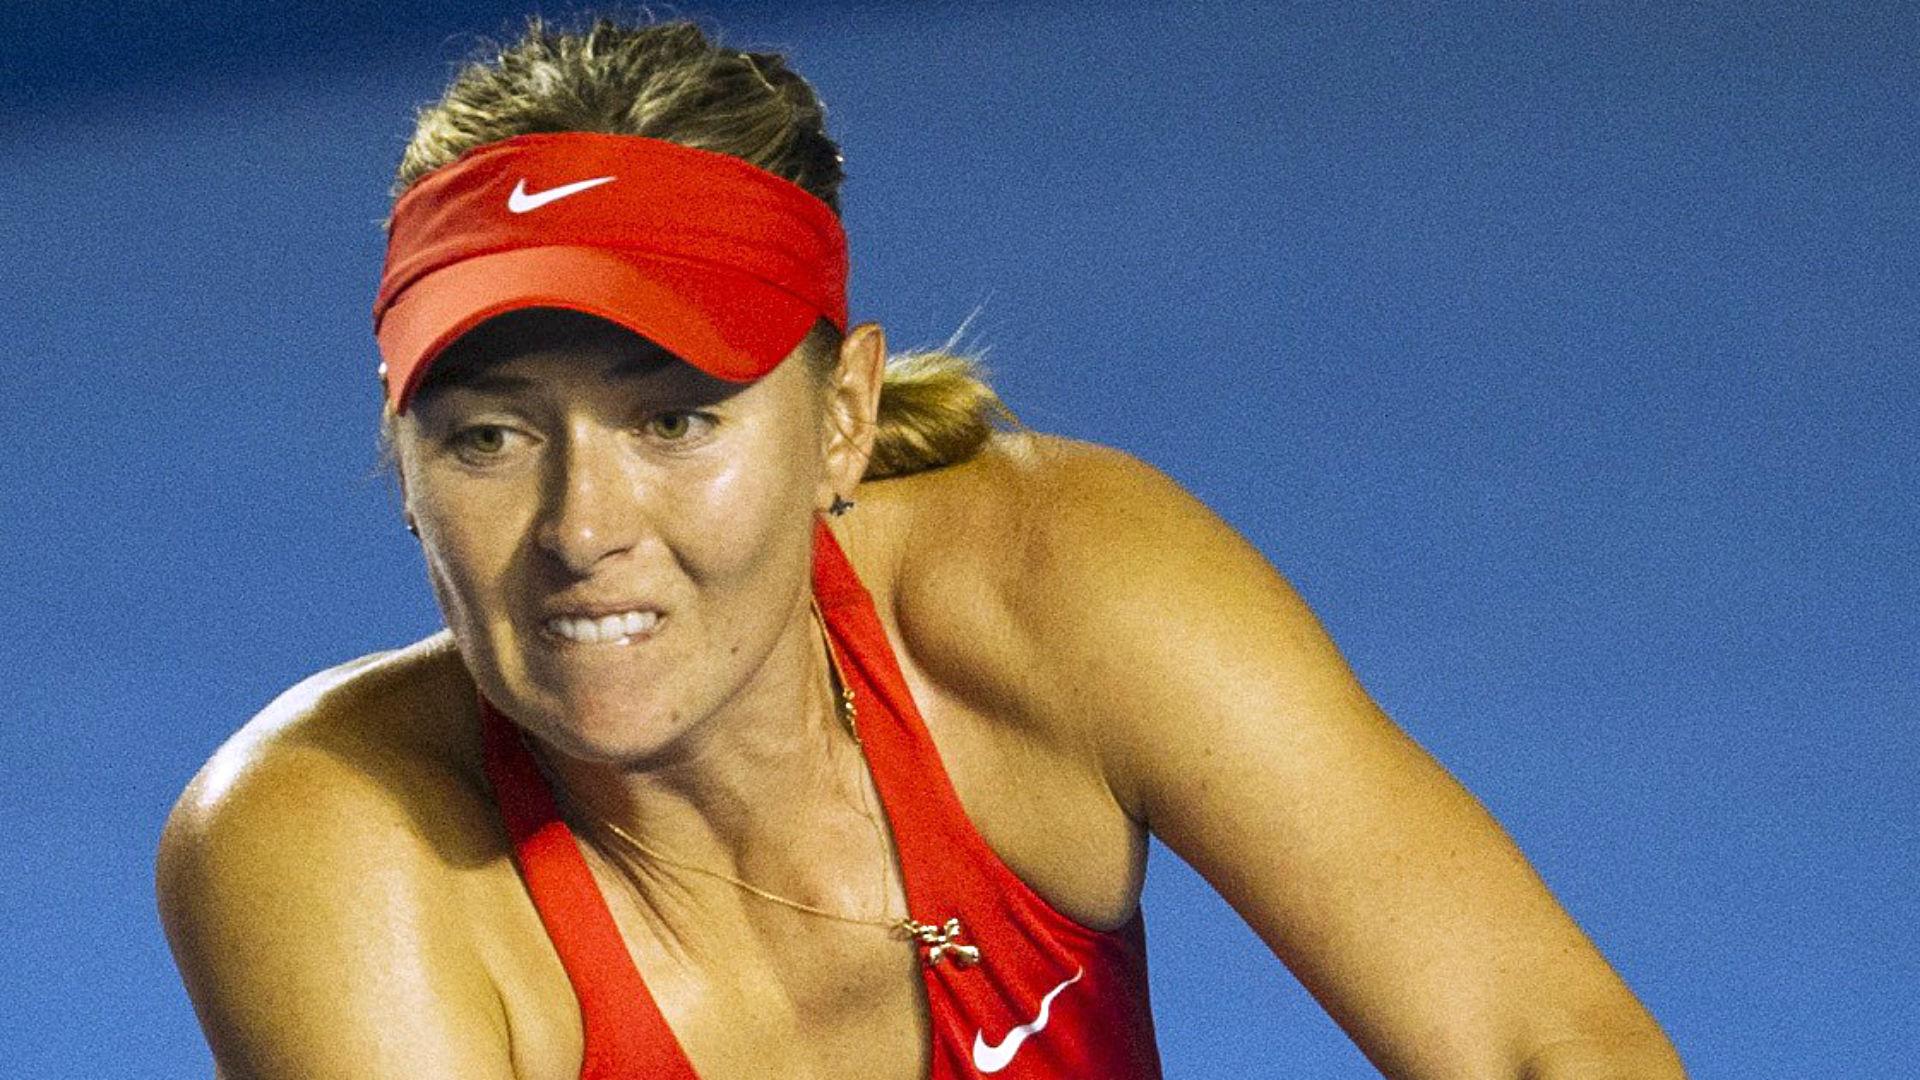 Maria-Sharapova-022715-Getty-FTR.jpg